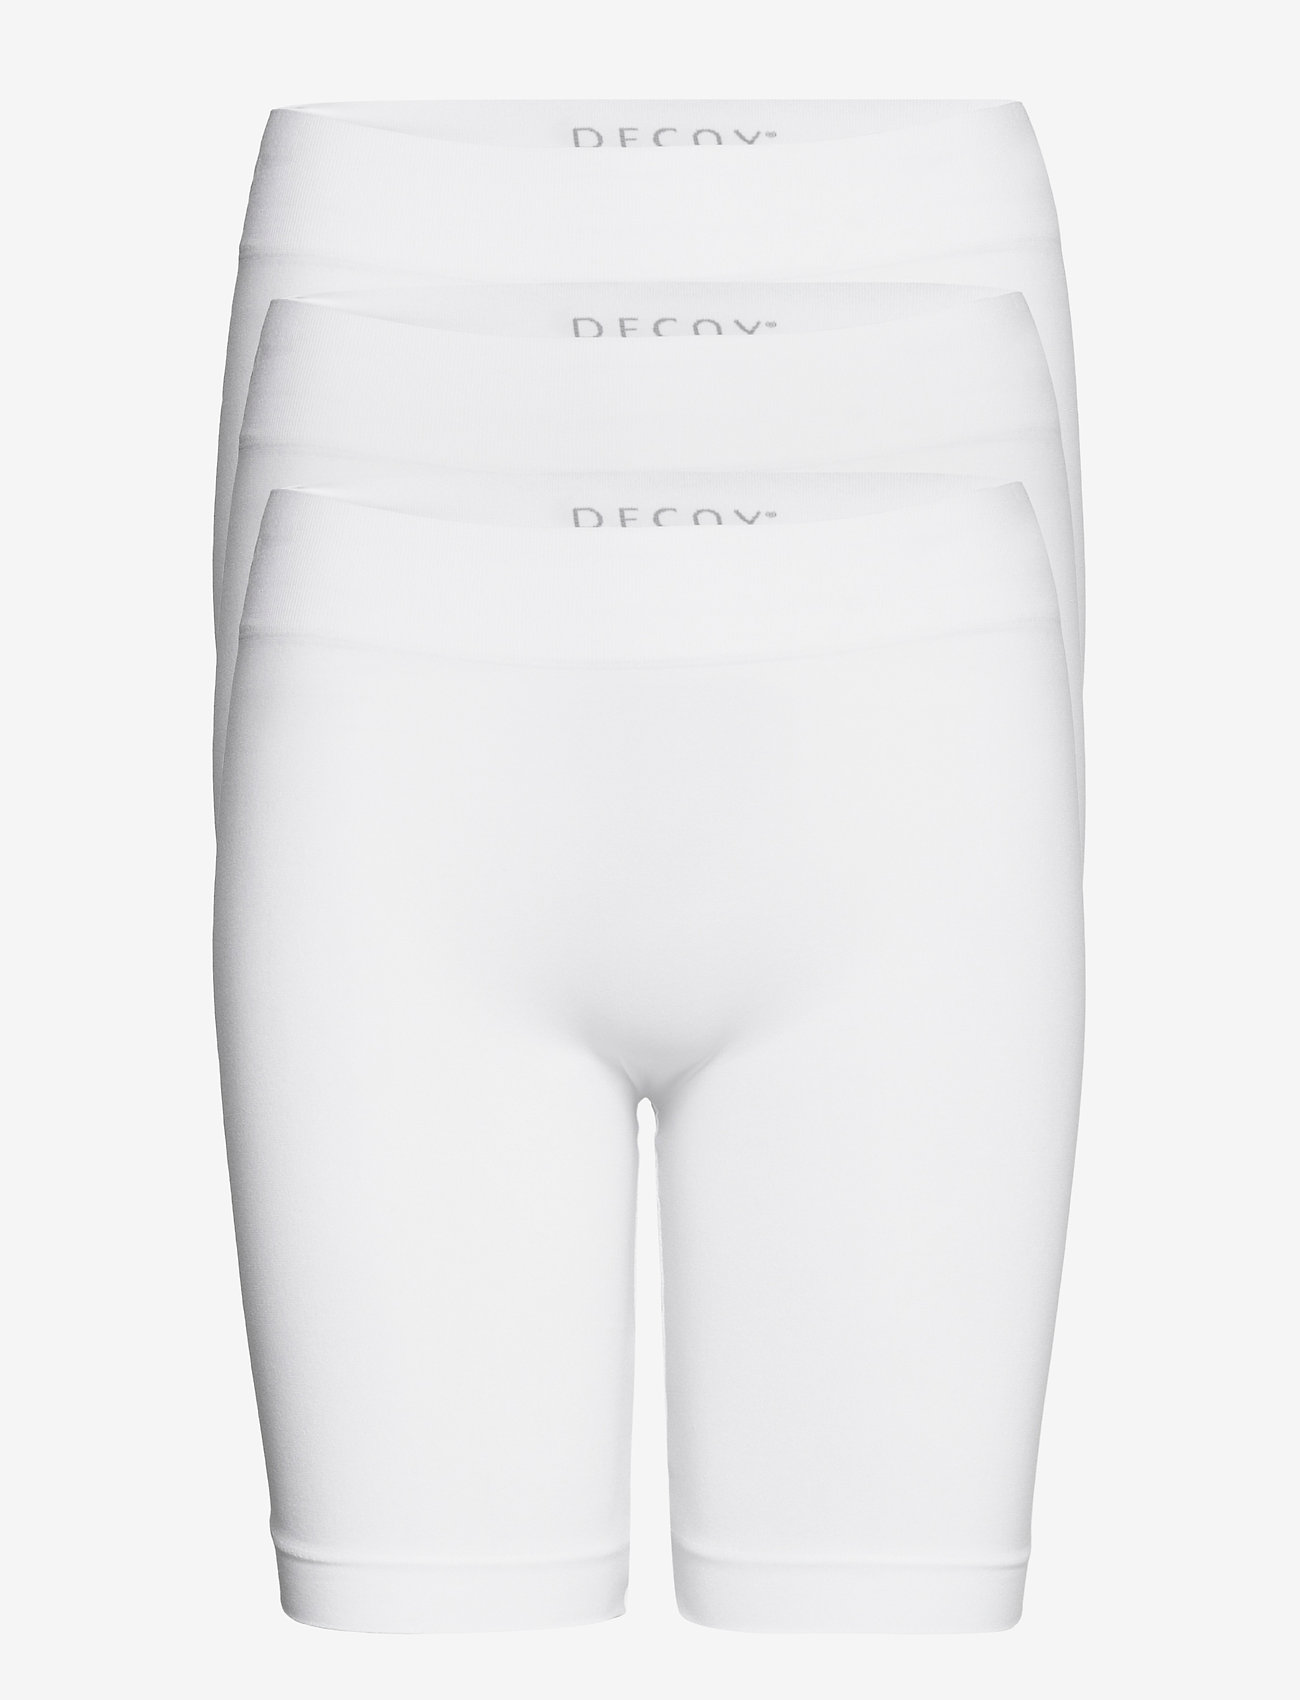 Decoy - DECOY 3-pack seamless shorts - bottoms - vit - 0